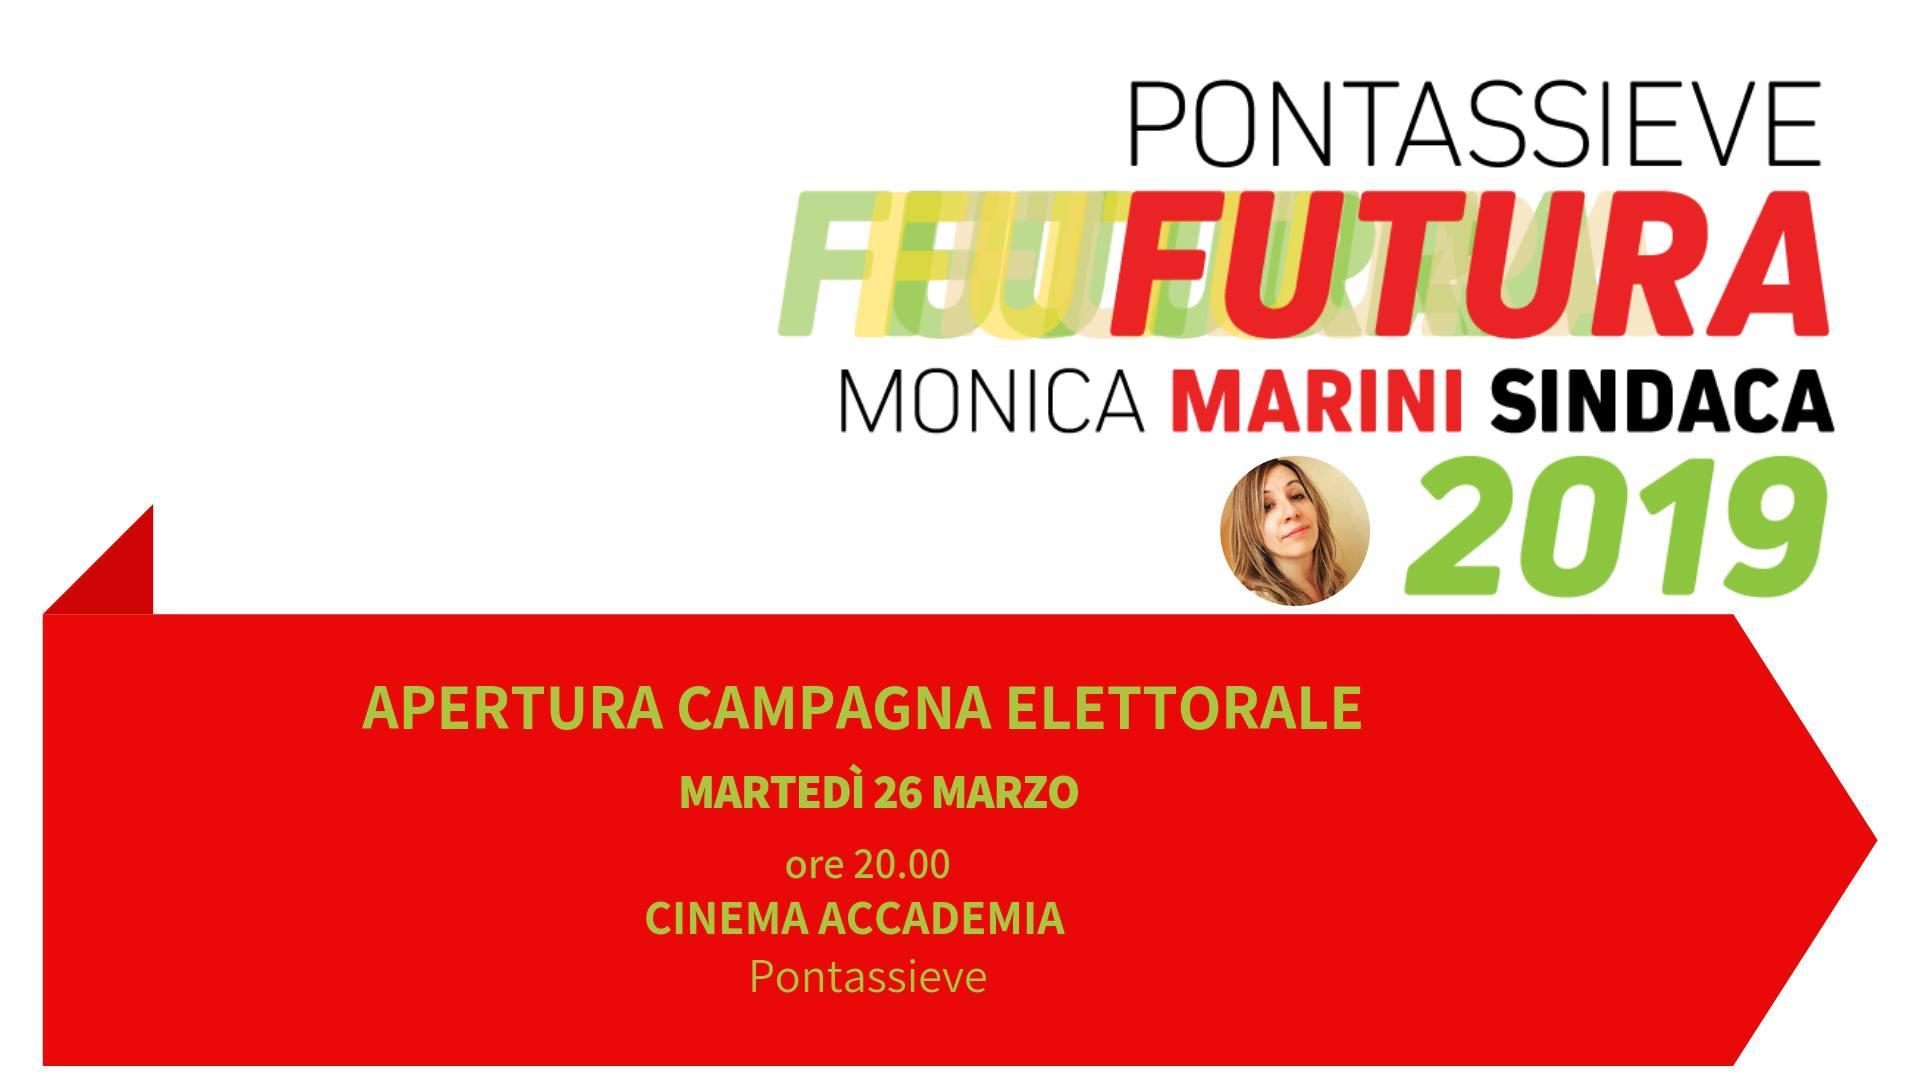 Pontassieve: apertura campagna elettorale per le Amministrative 2019